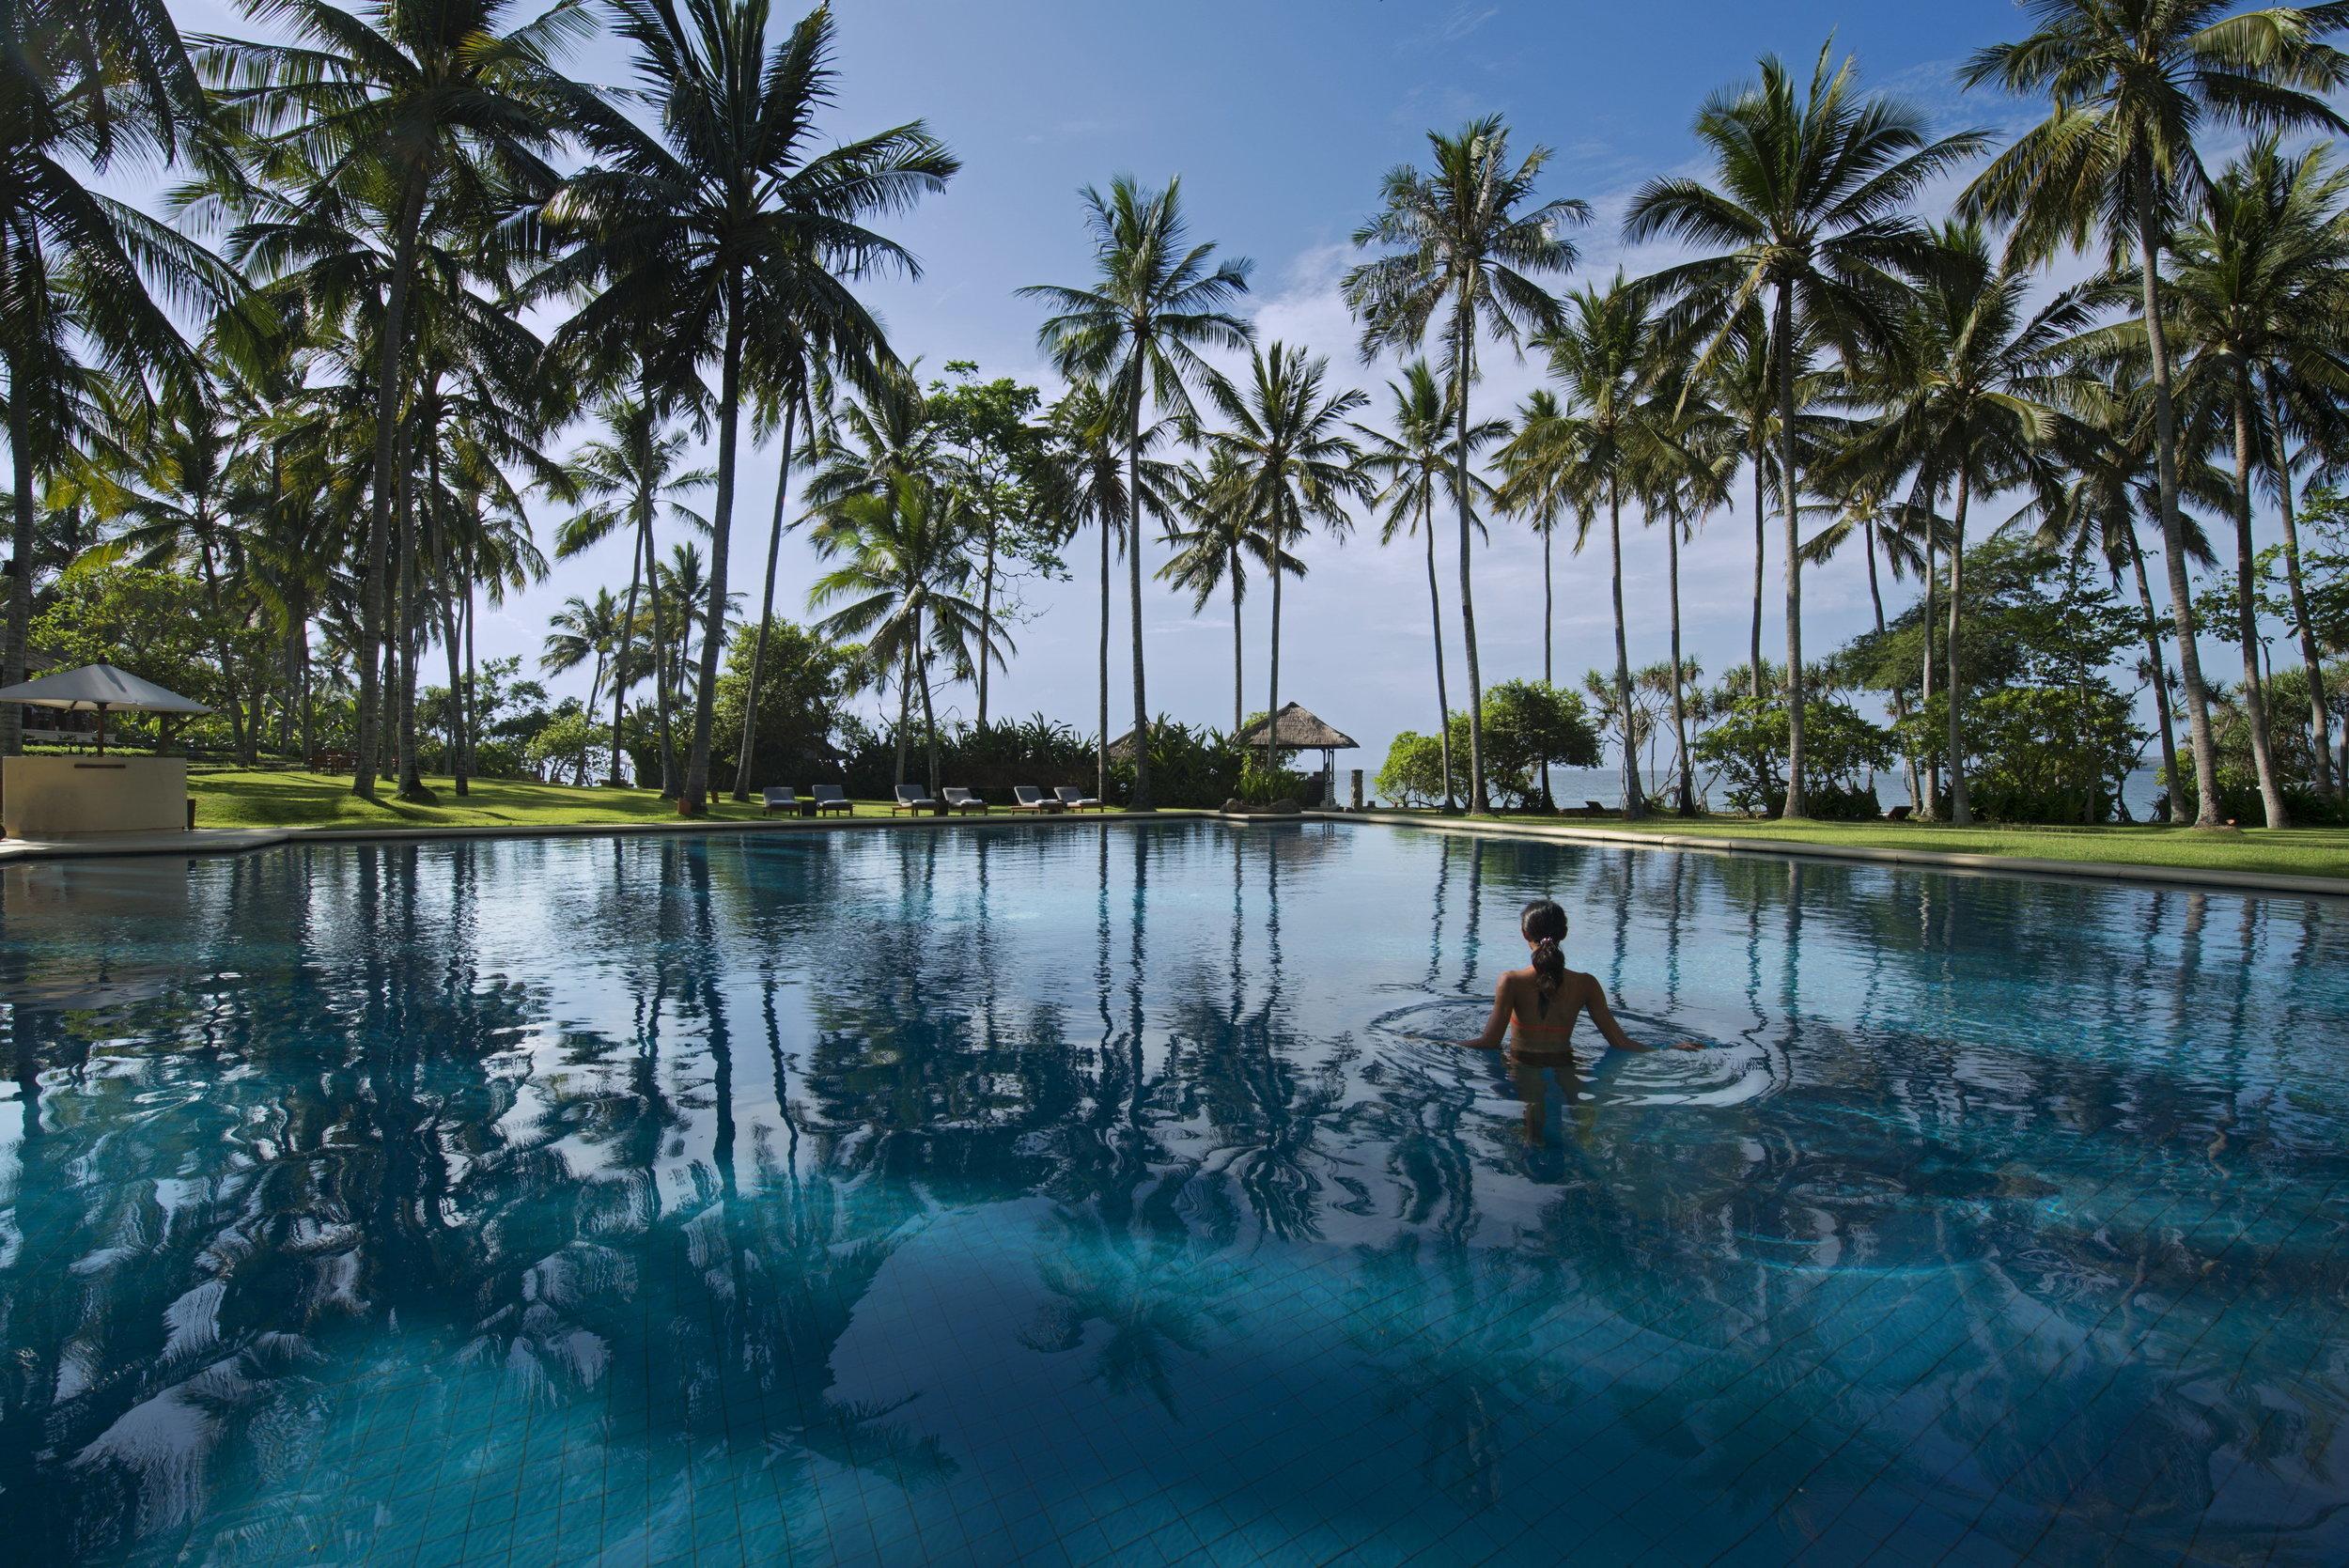 Alila Manggis - Exterior - Pool by day 02.jpg